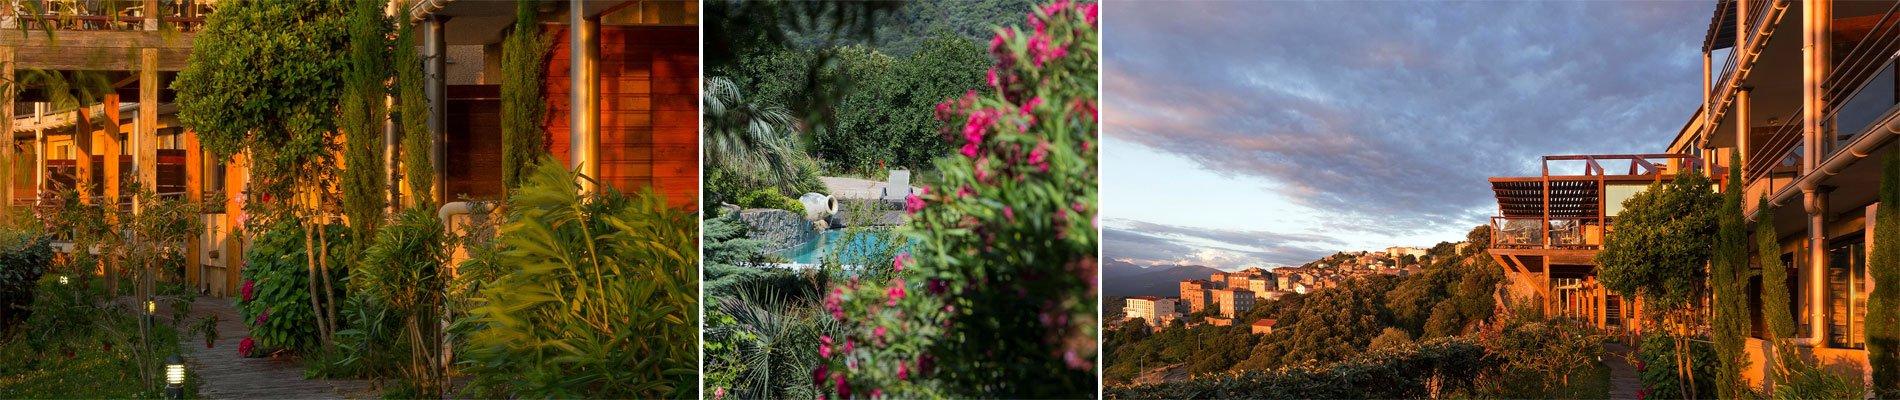 hotel-san-damianu-sartene-corsica-reize